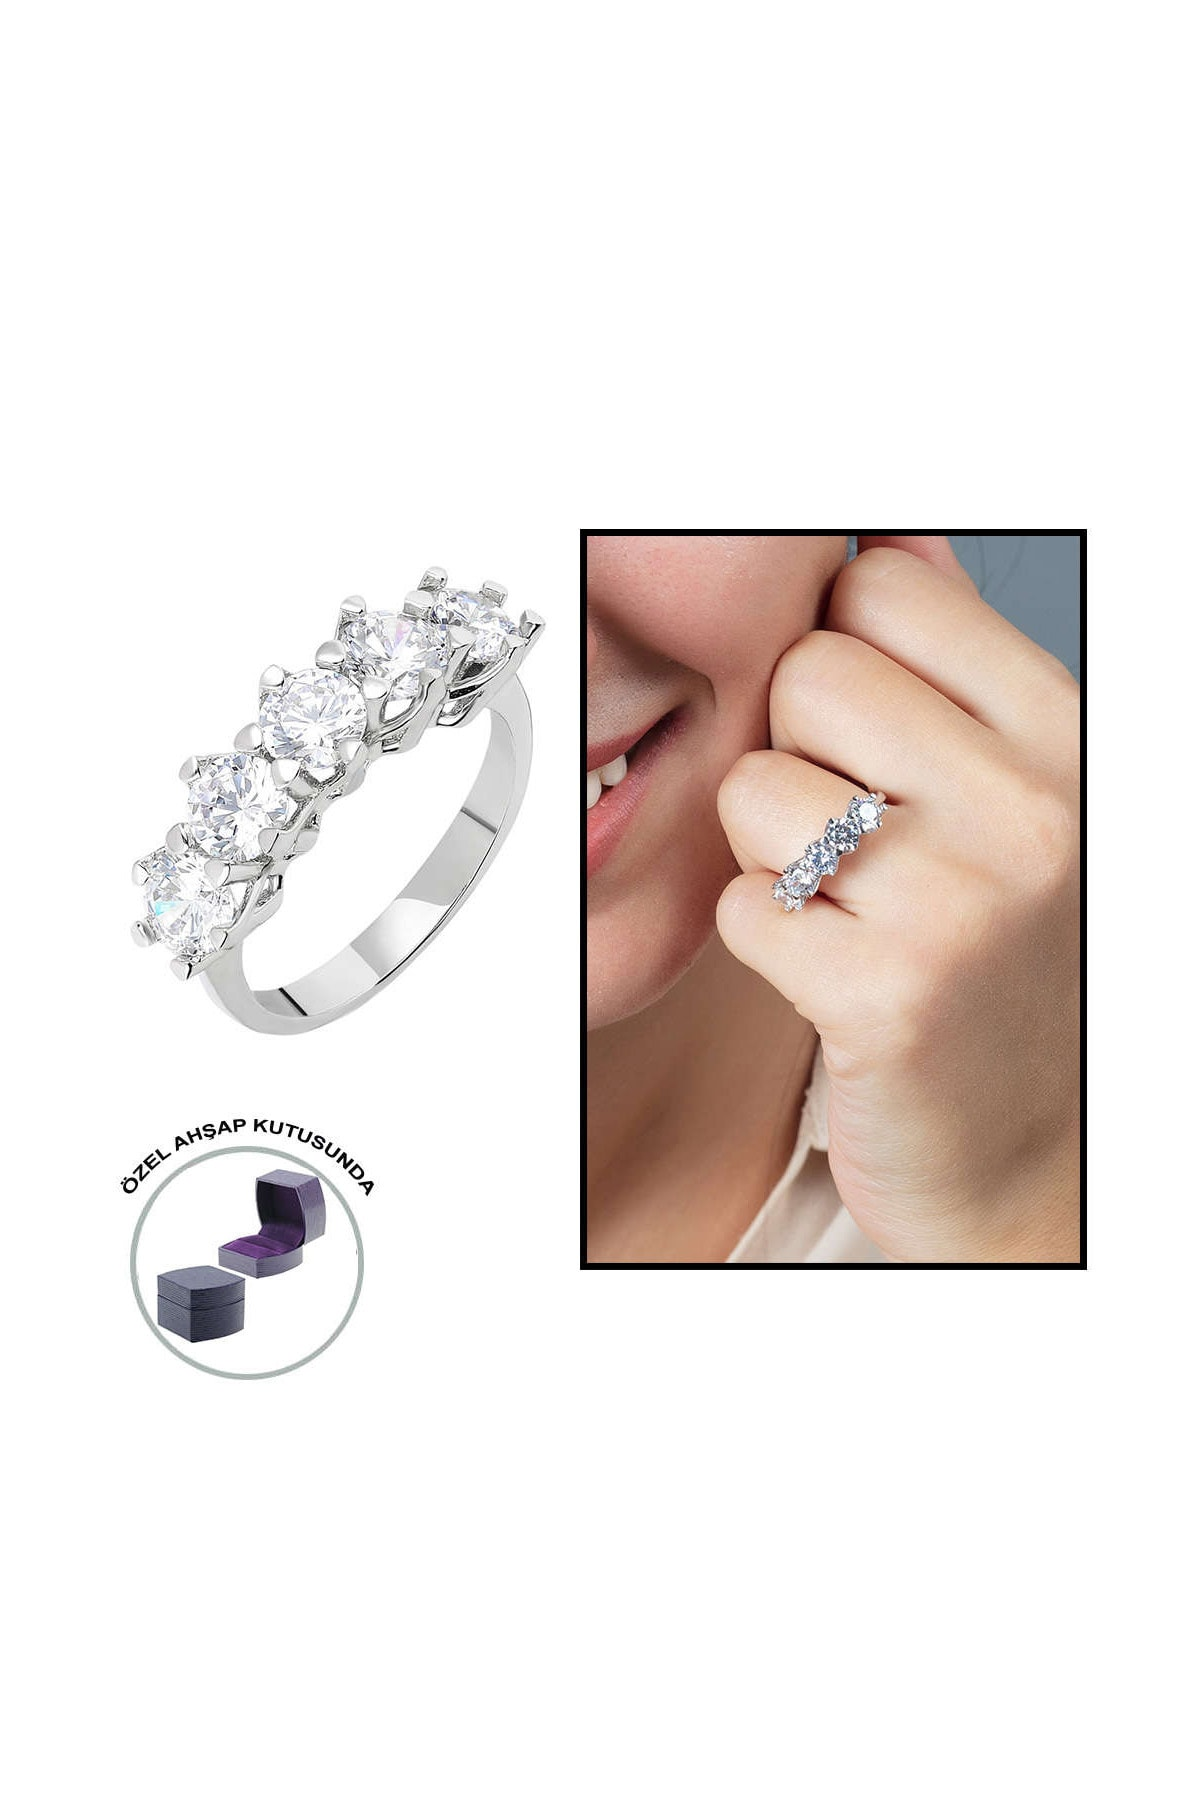 Tesbihane Starlight Diamond Pırlanta Montür 925 Ayar Gümüş Bayan Beştaş Yüzük 102001816 0